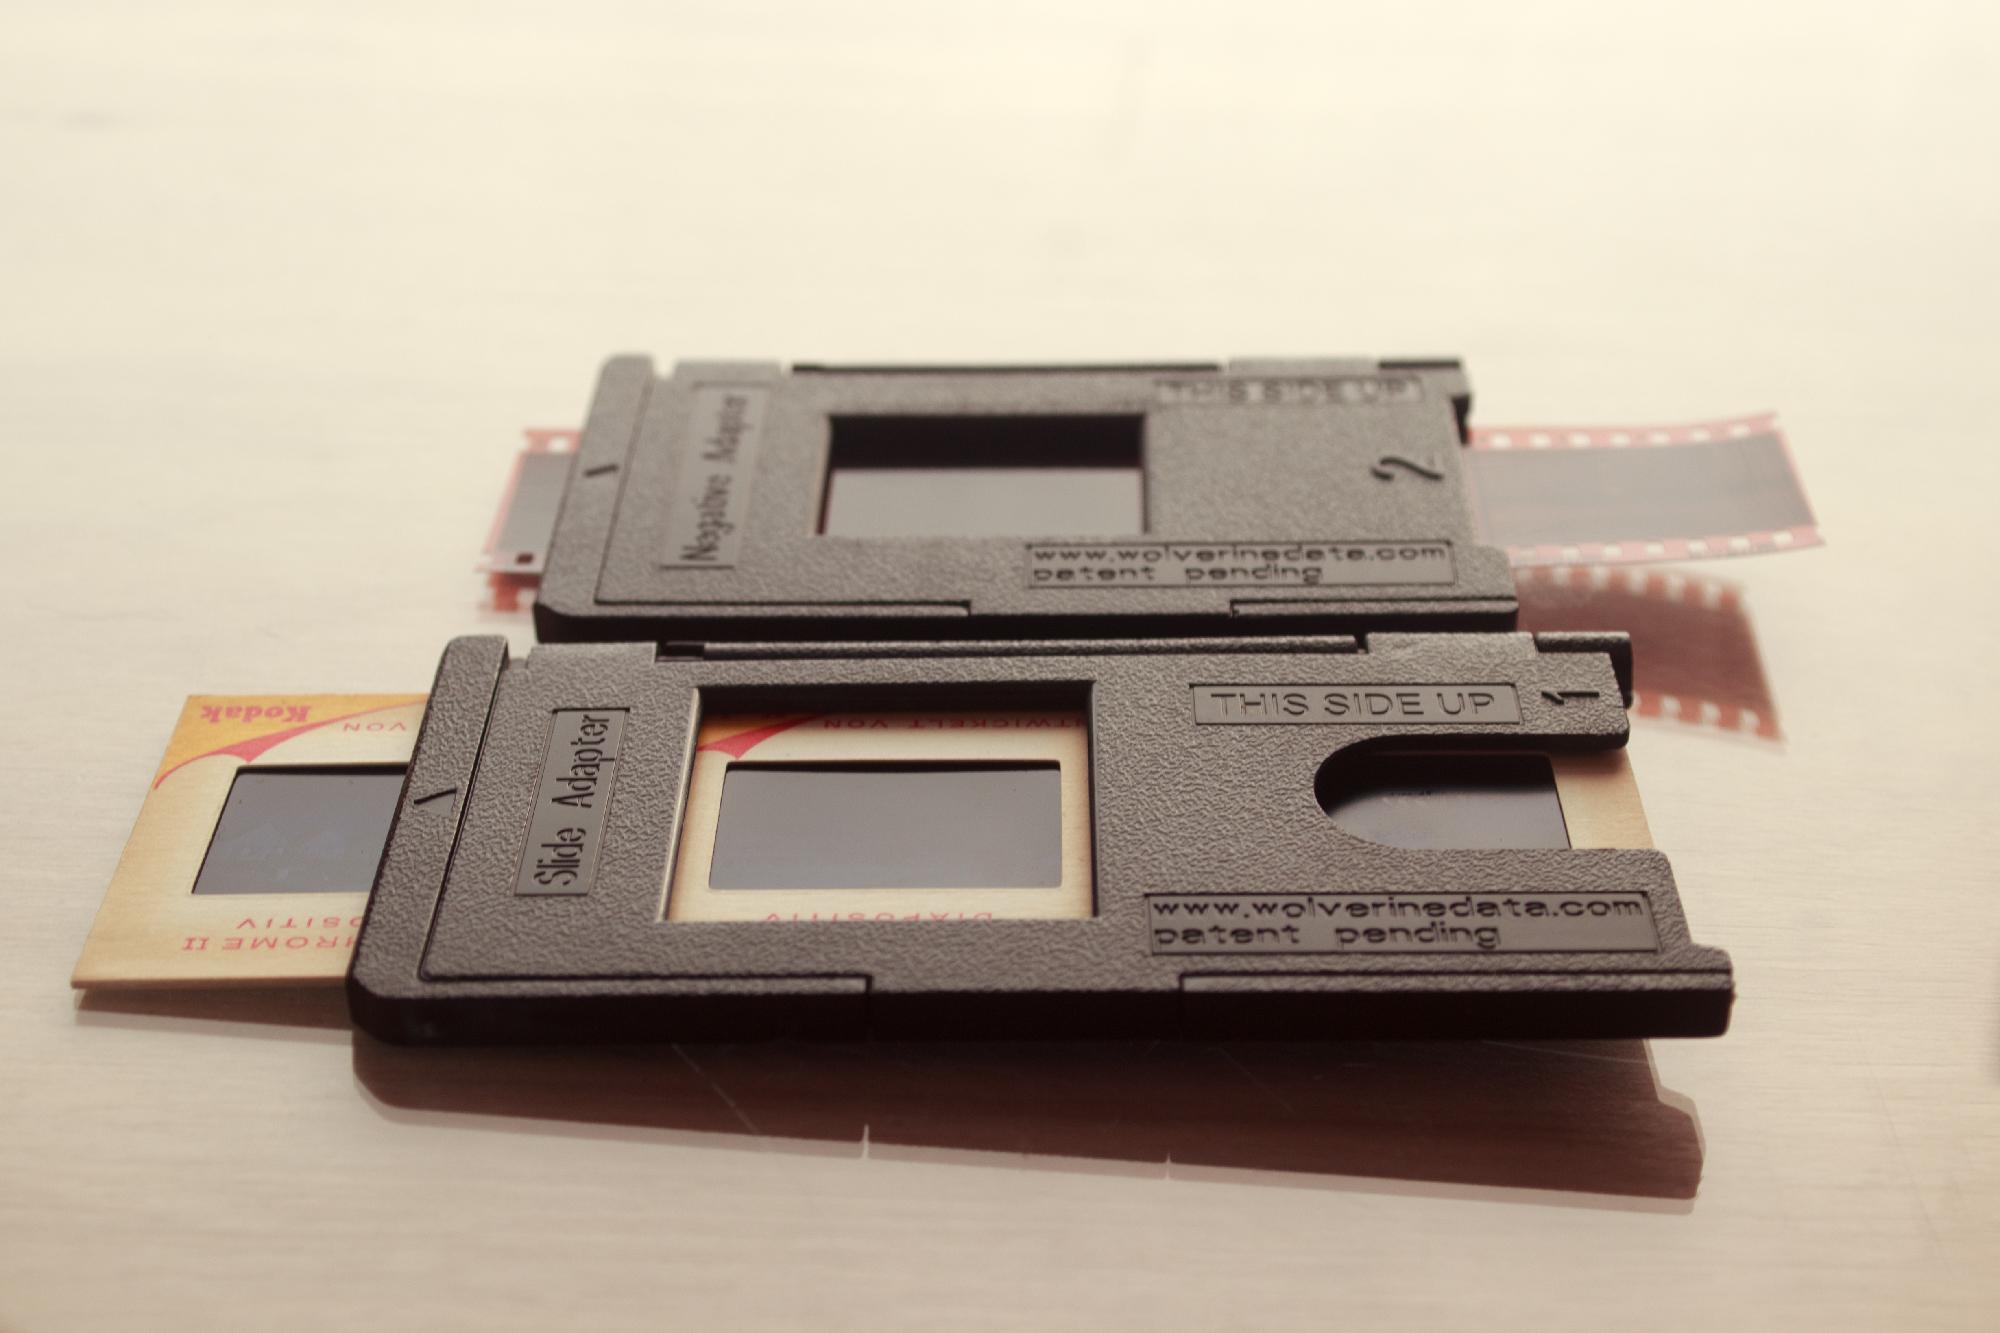 High-Resolution Jumbl 22MP Scanner //Digitizer Converts 35mm Negative Films